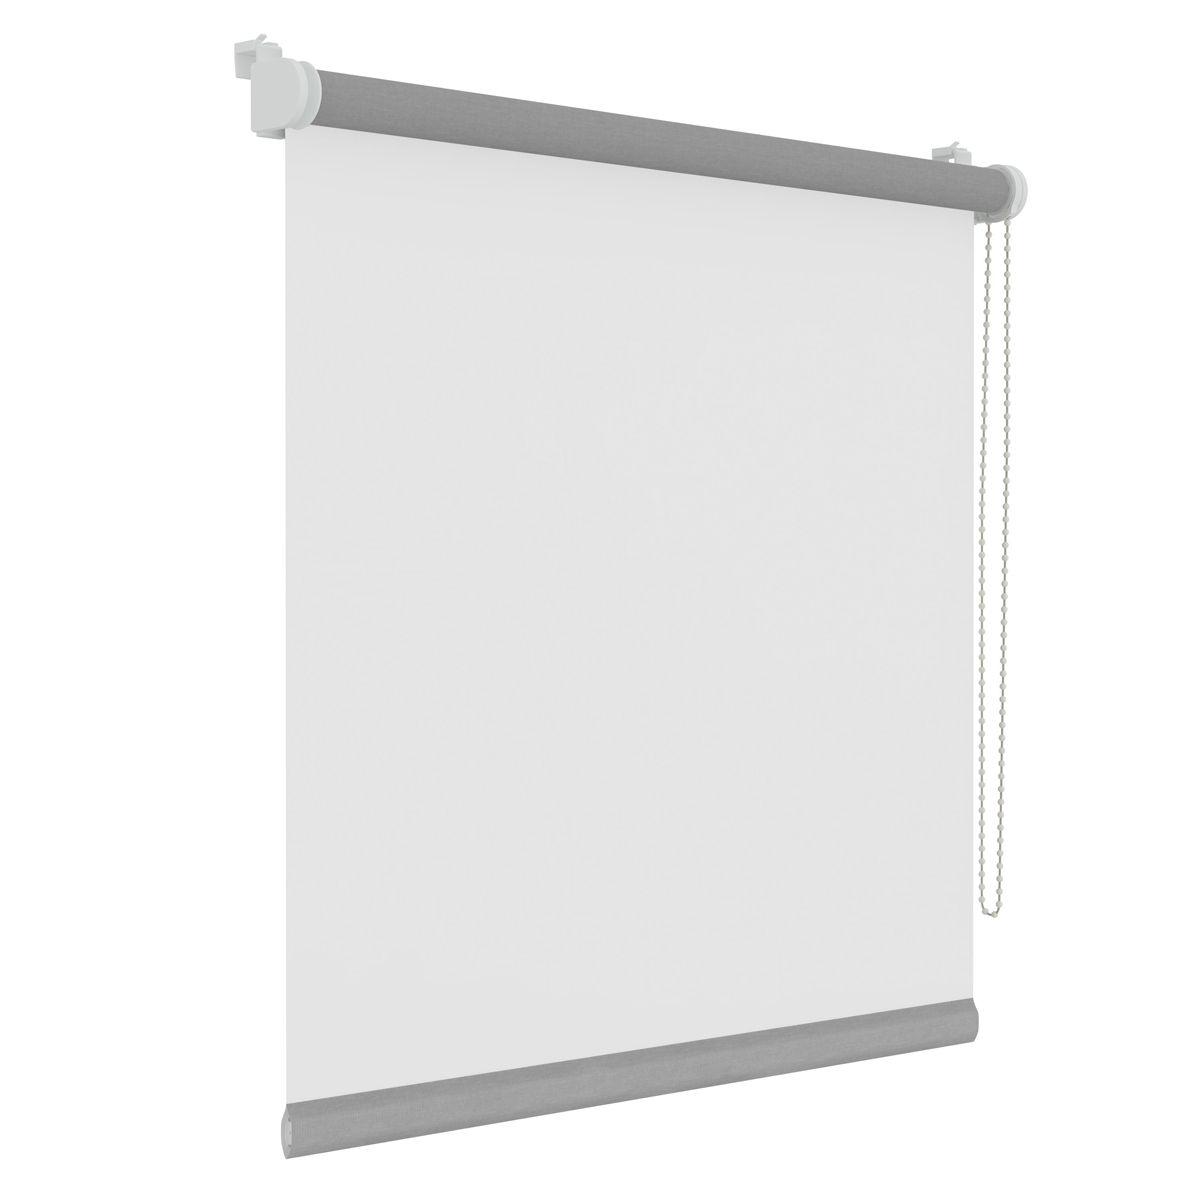 Store enrouleur Myrdall blanc 57x160cm